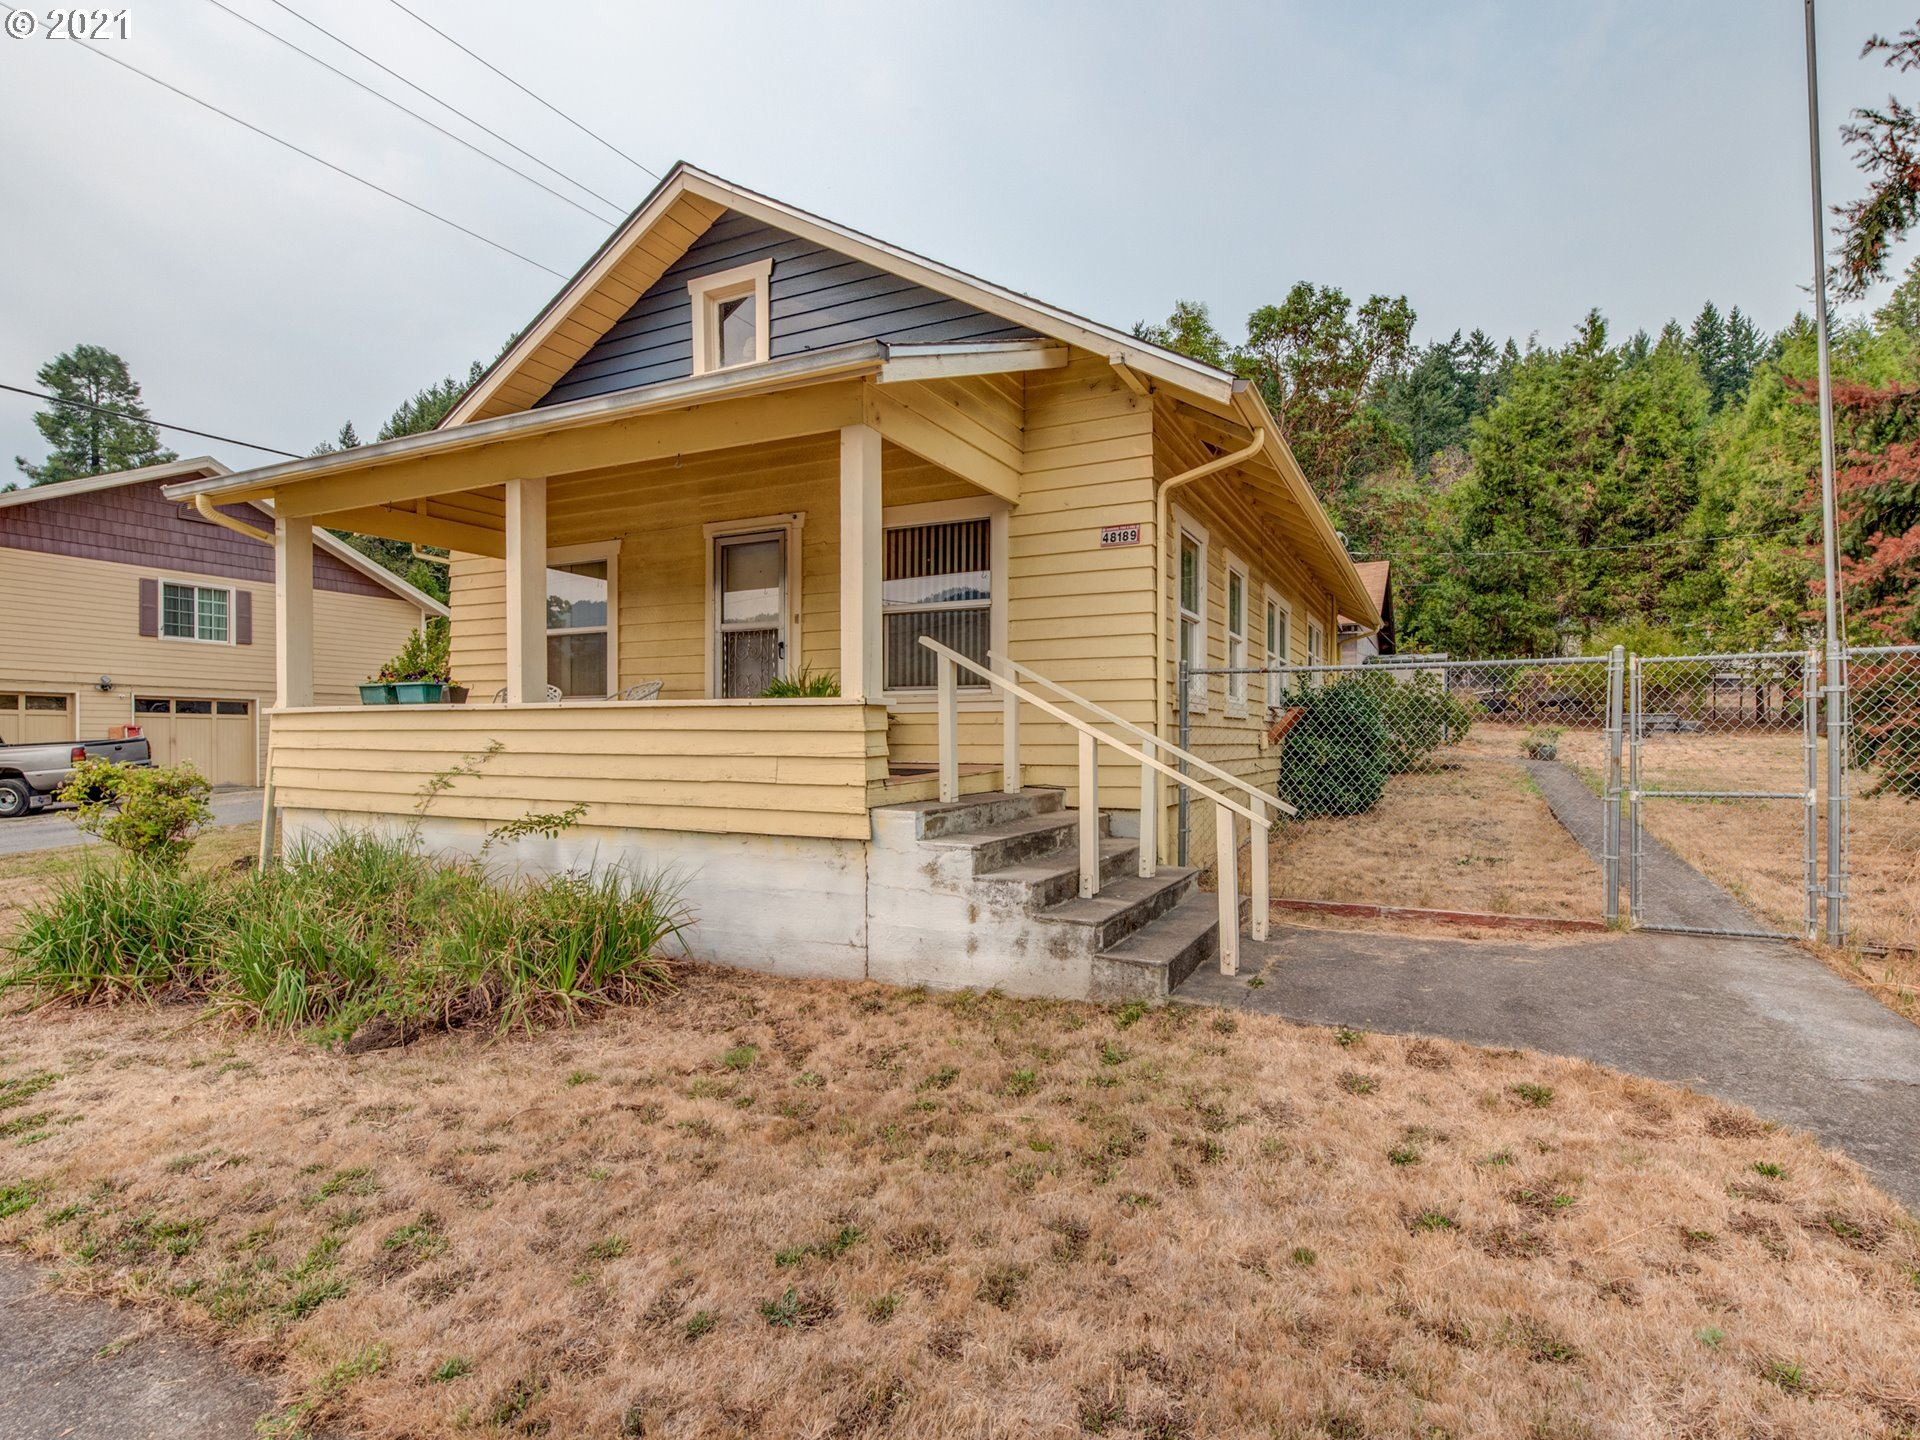 Photo for 48189 E 1ST ST, Oakridge, OR 97463 (MLS # 21094915)